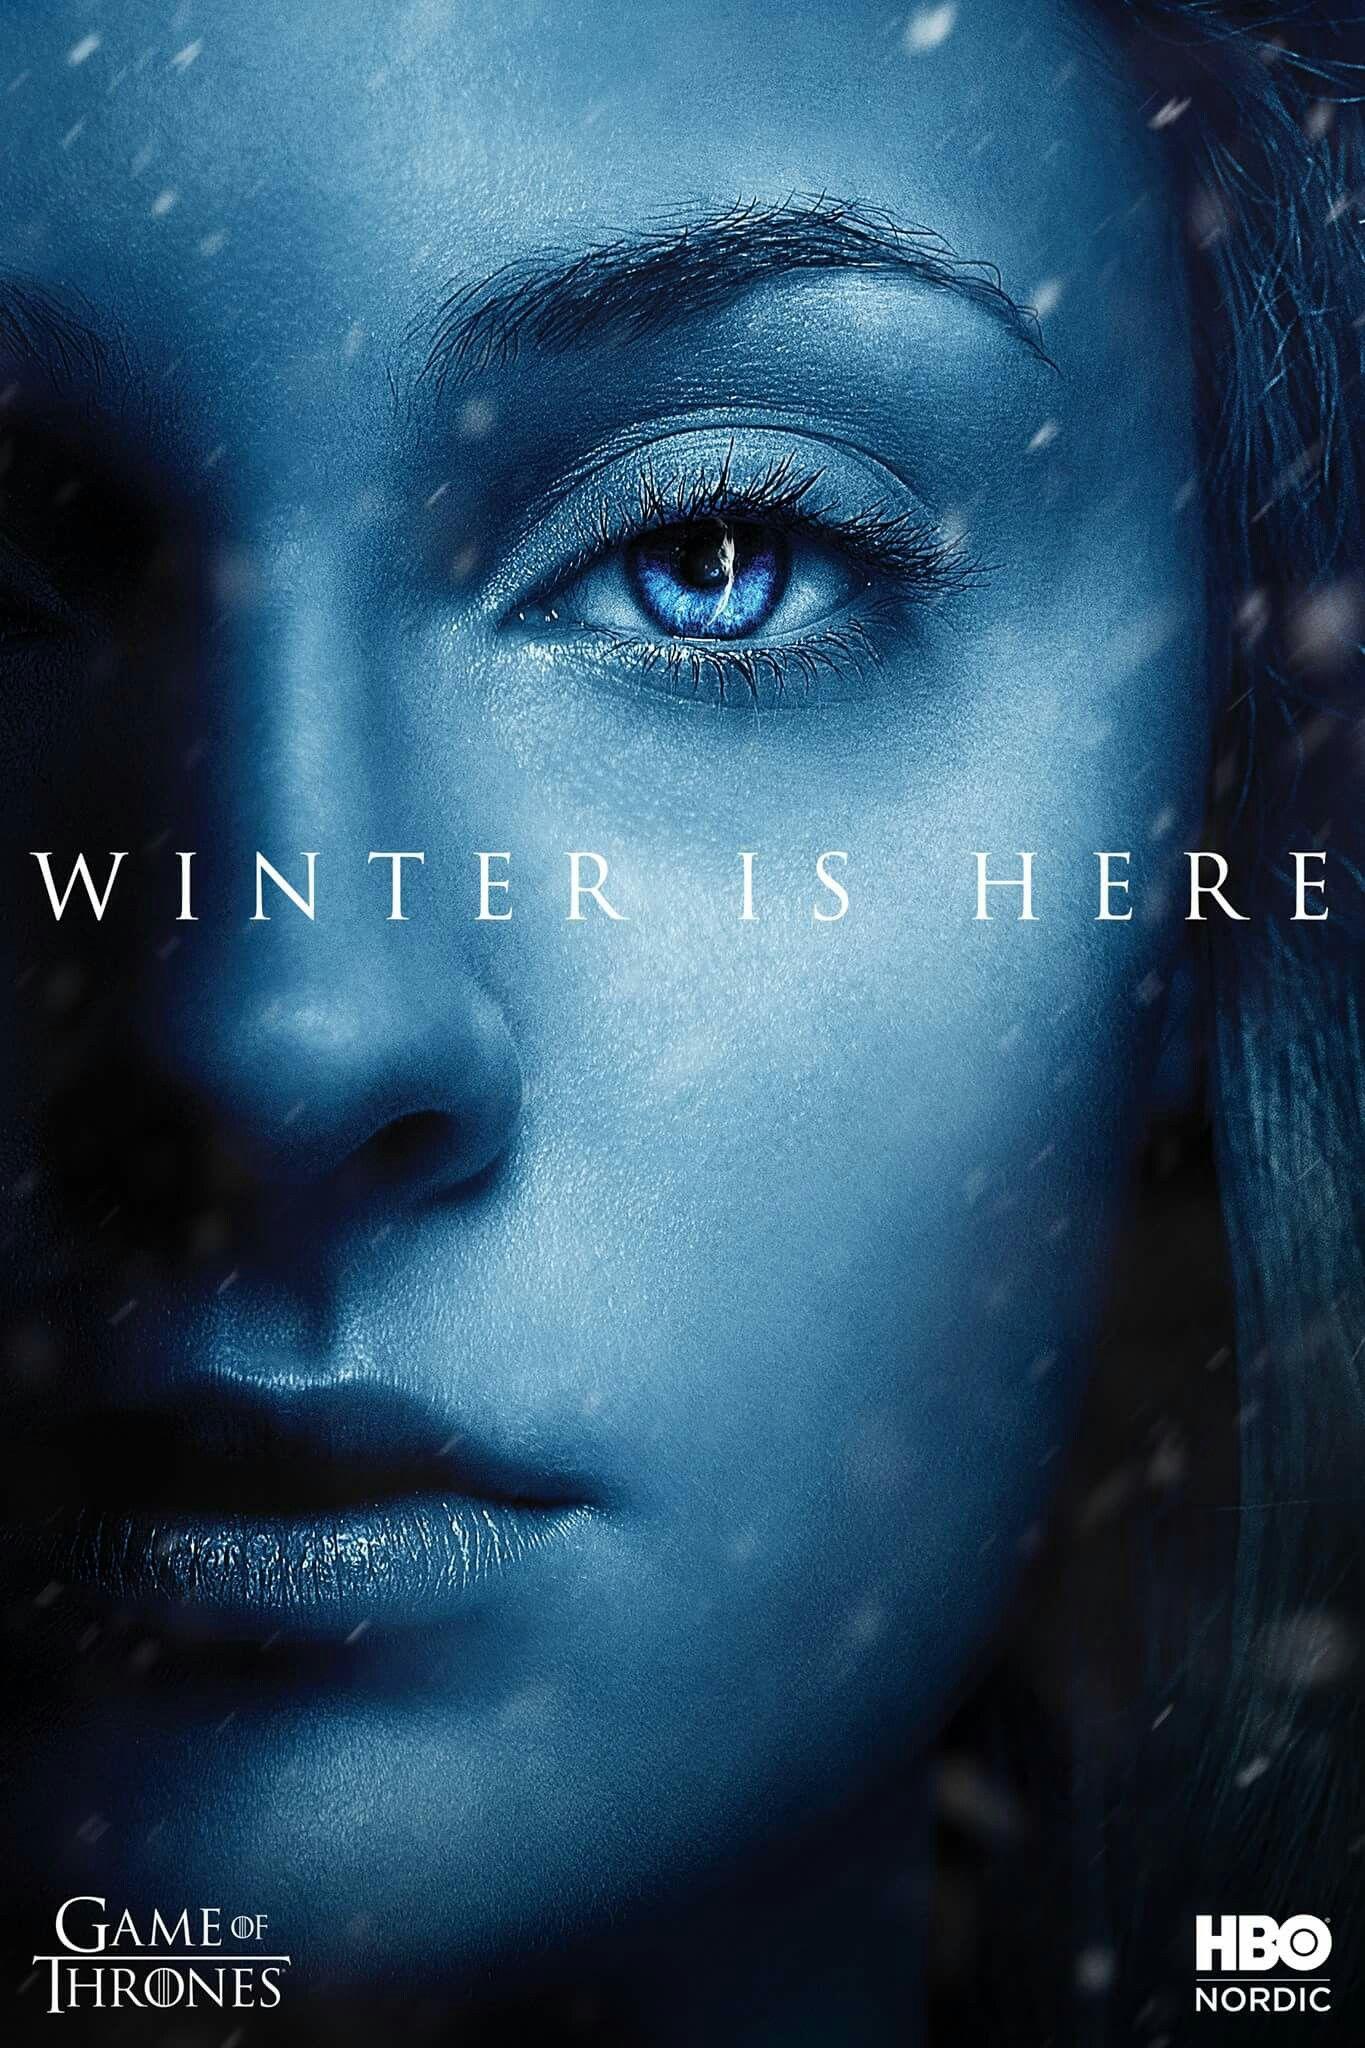 Pin By Rutuja On Cool Photos Sansa Stark Wallpaper Hbo Sansa Starks game of thrones season 7